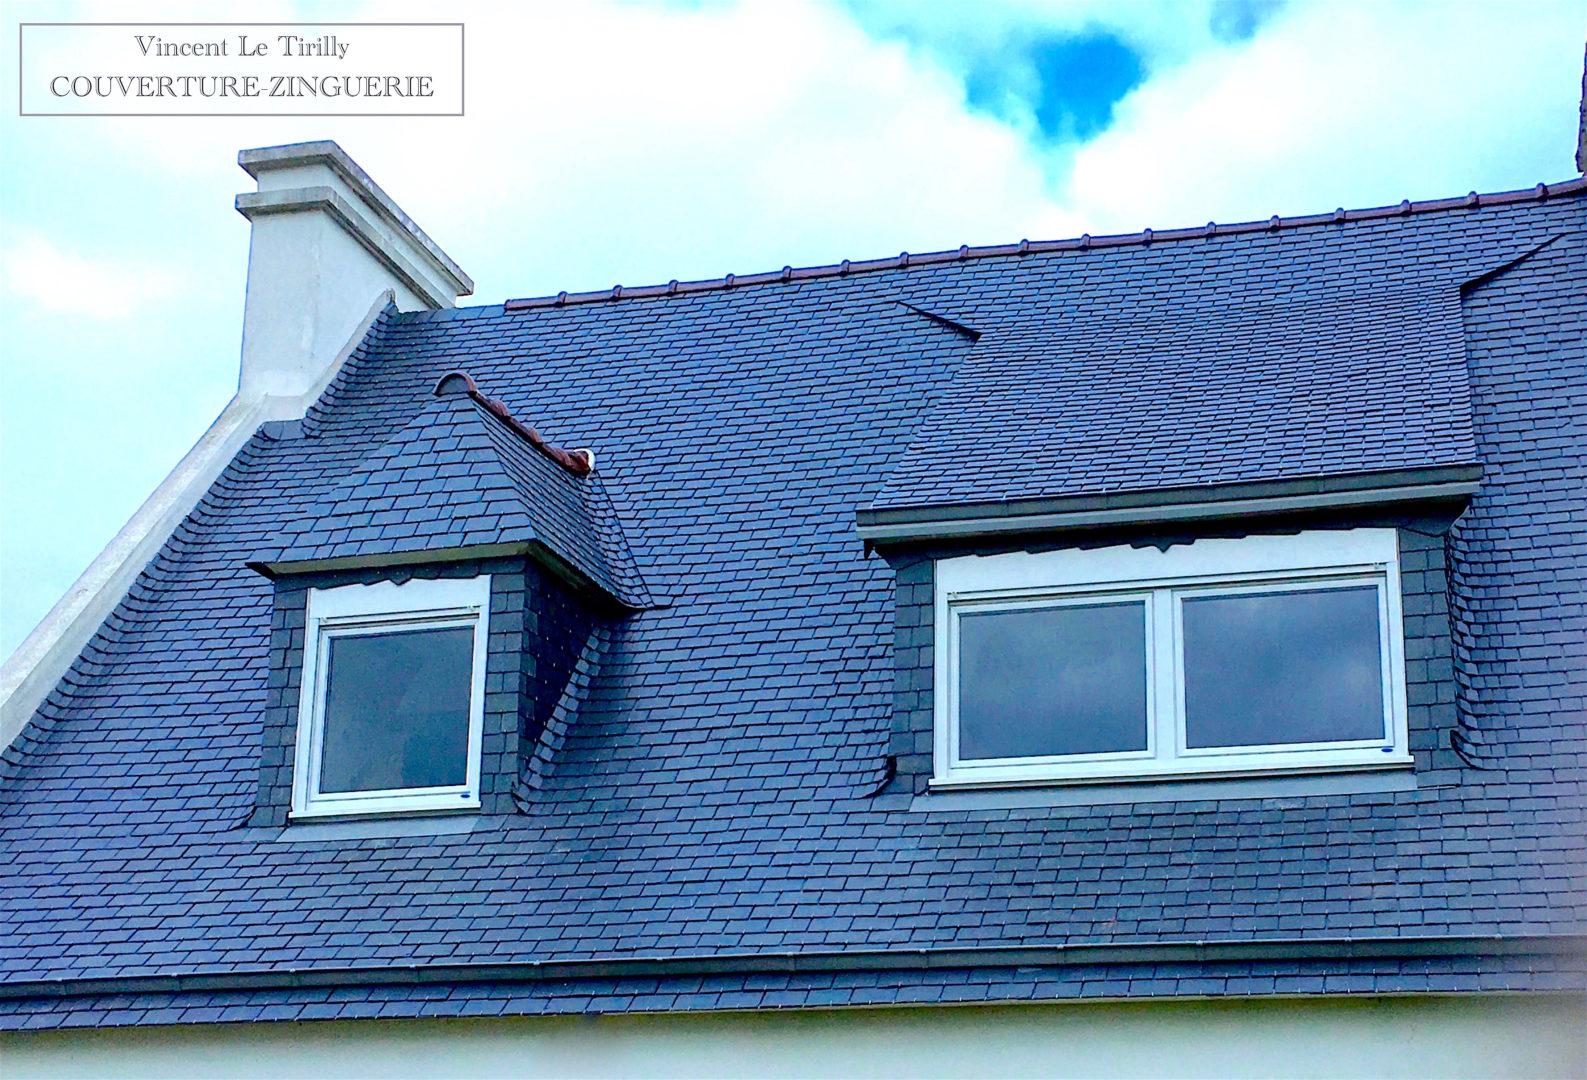 rénovation-toiture-maison-ardoises-Fouesnant-1